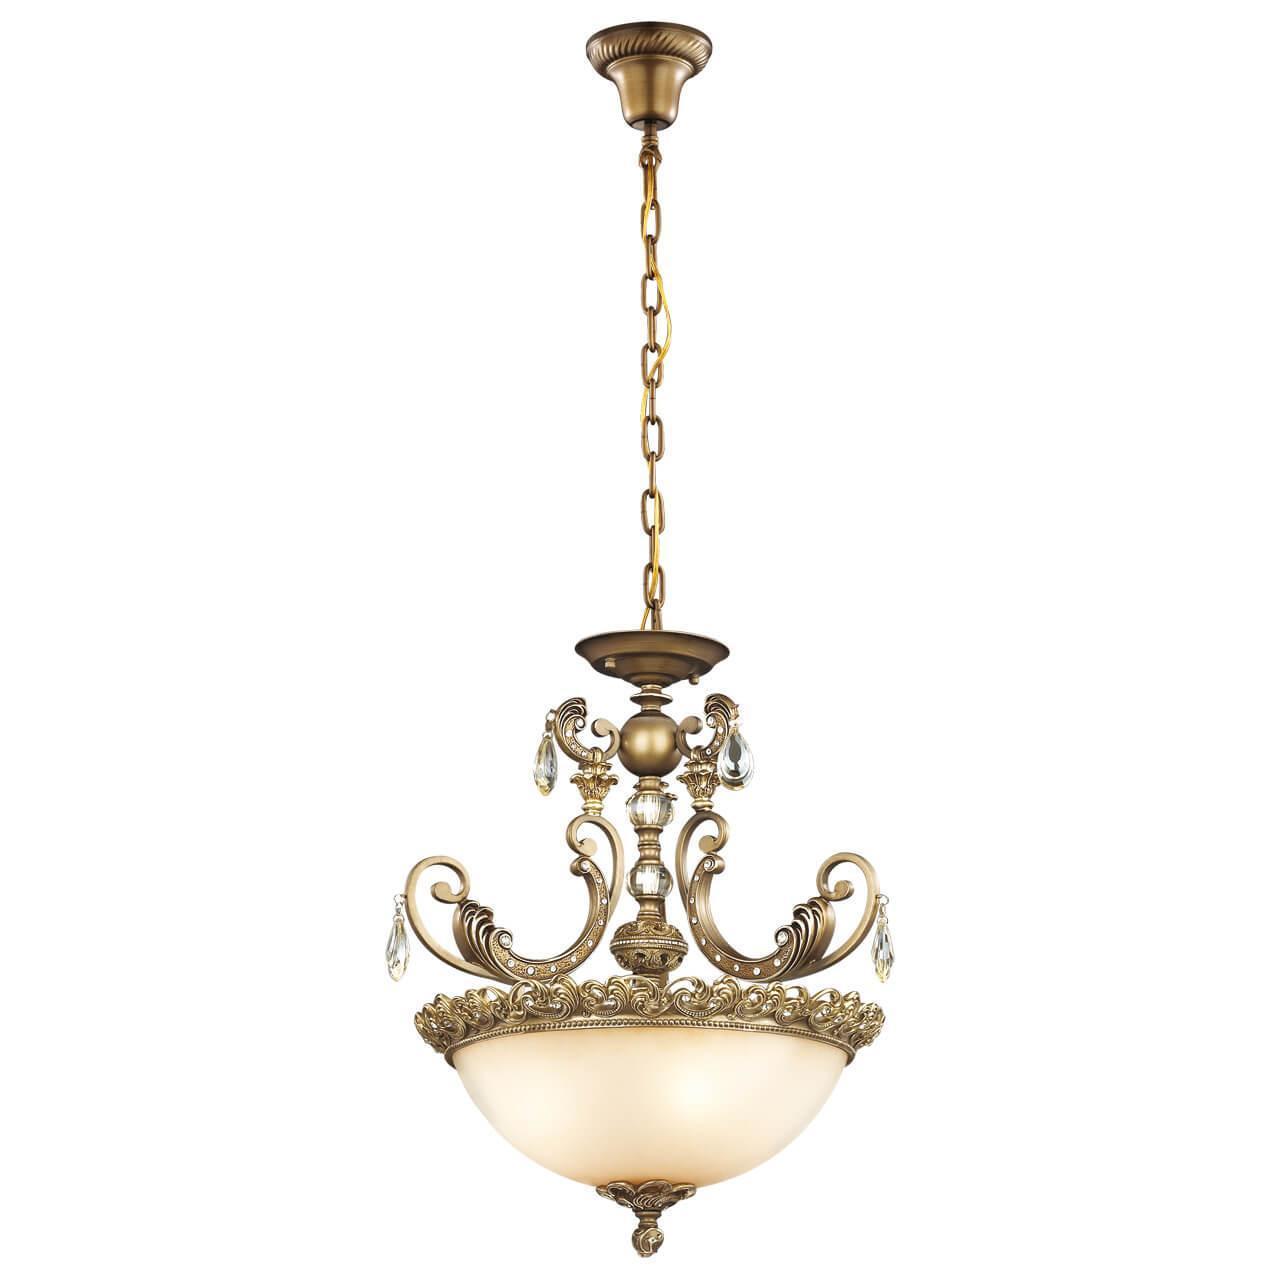 Фото - Подвесной светильник Odeon Light 2431/3, E27, 60 Вт бра odeon light ponga 2431 2w